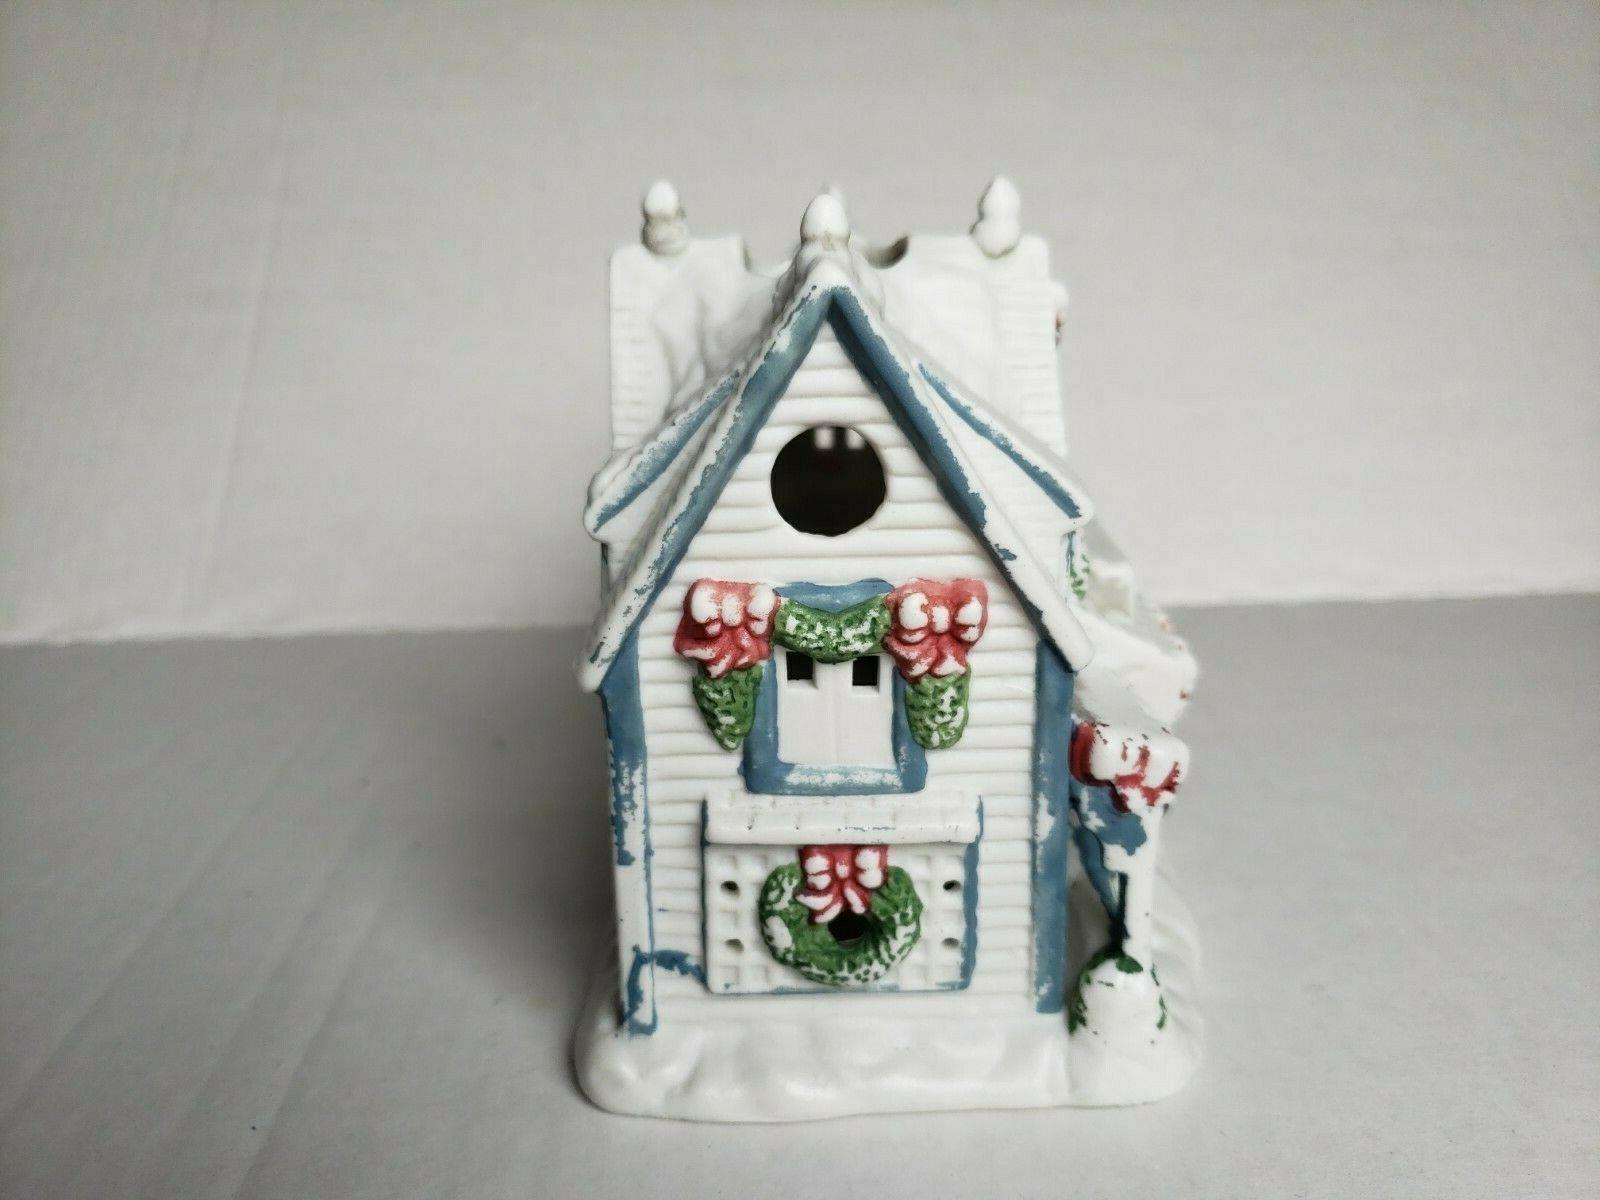 Cape Cod Candle Shop Tealight Candle Holder Holiday Village PartyLite P0532 Vtg